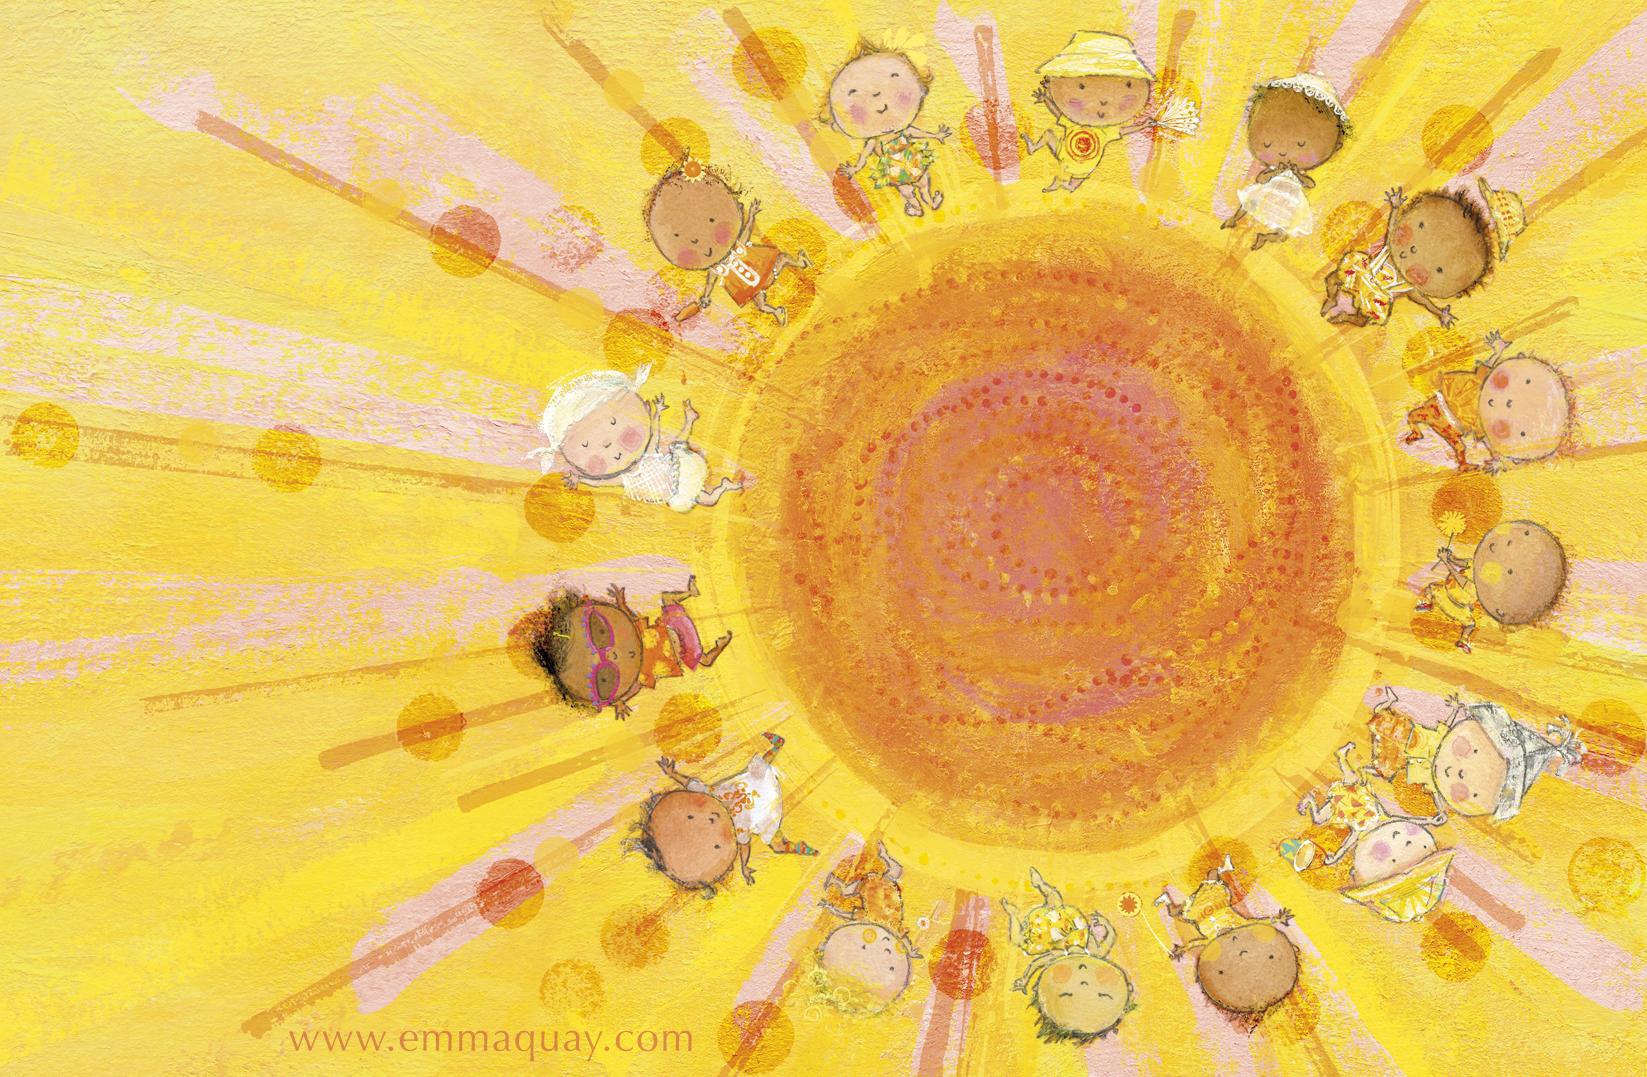 """If babies were sunbeams"" illustration from MY SUNBEAM BABY by Emma Quay (ABC Books) - www.emmaquay.com"